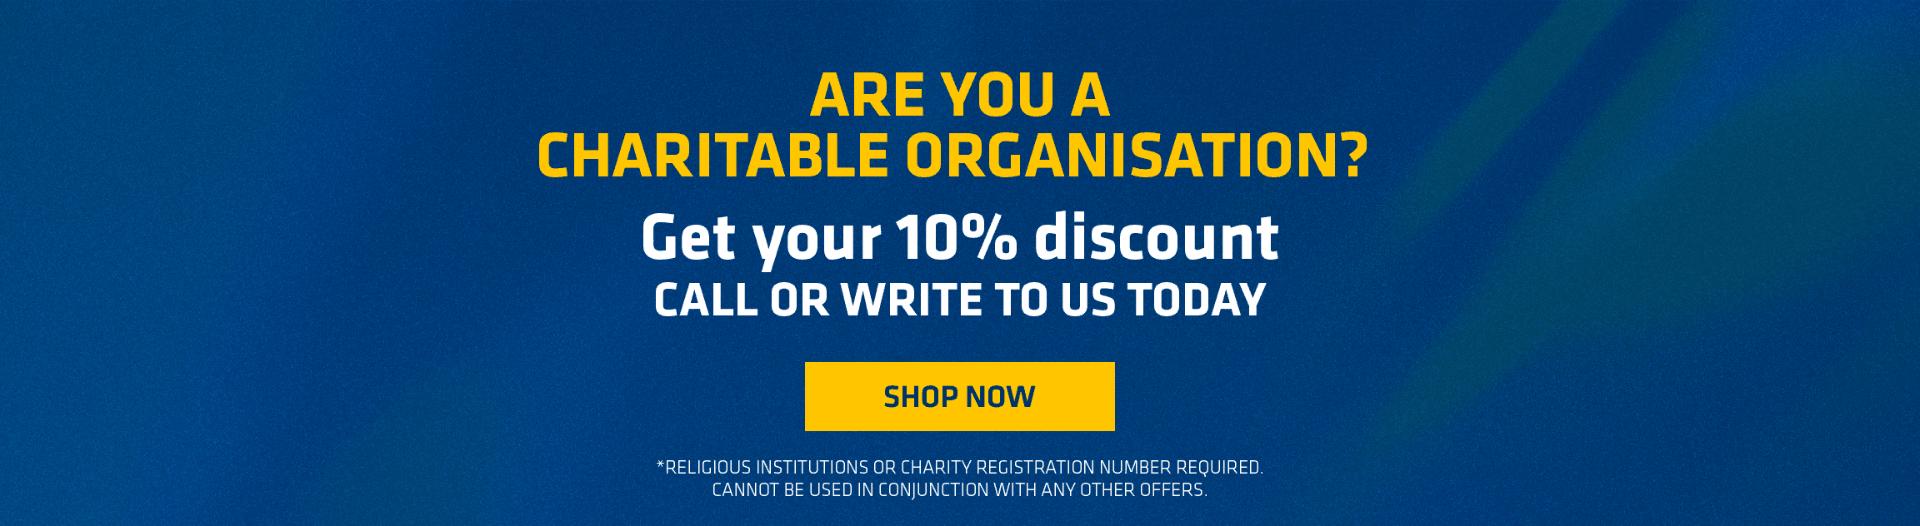 10% discount to any Religious Establishments